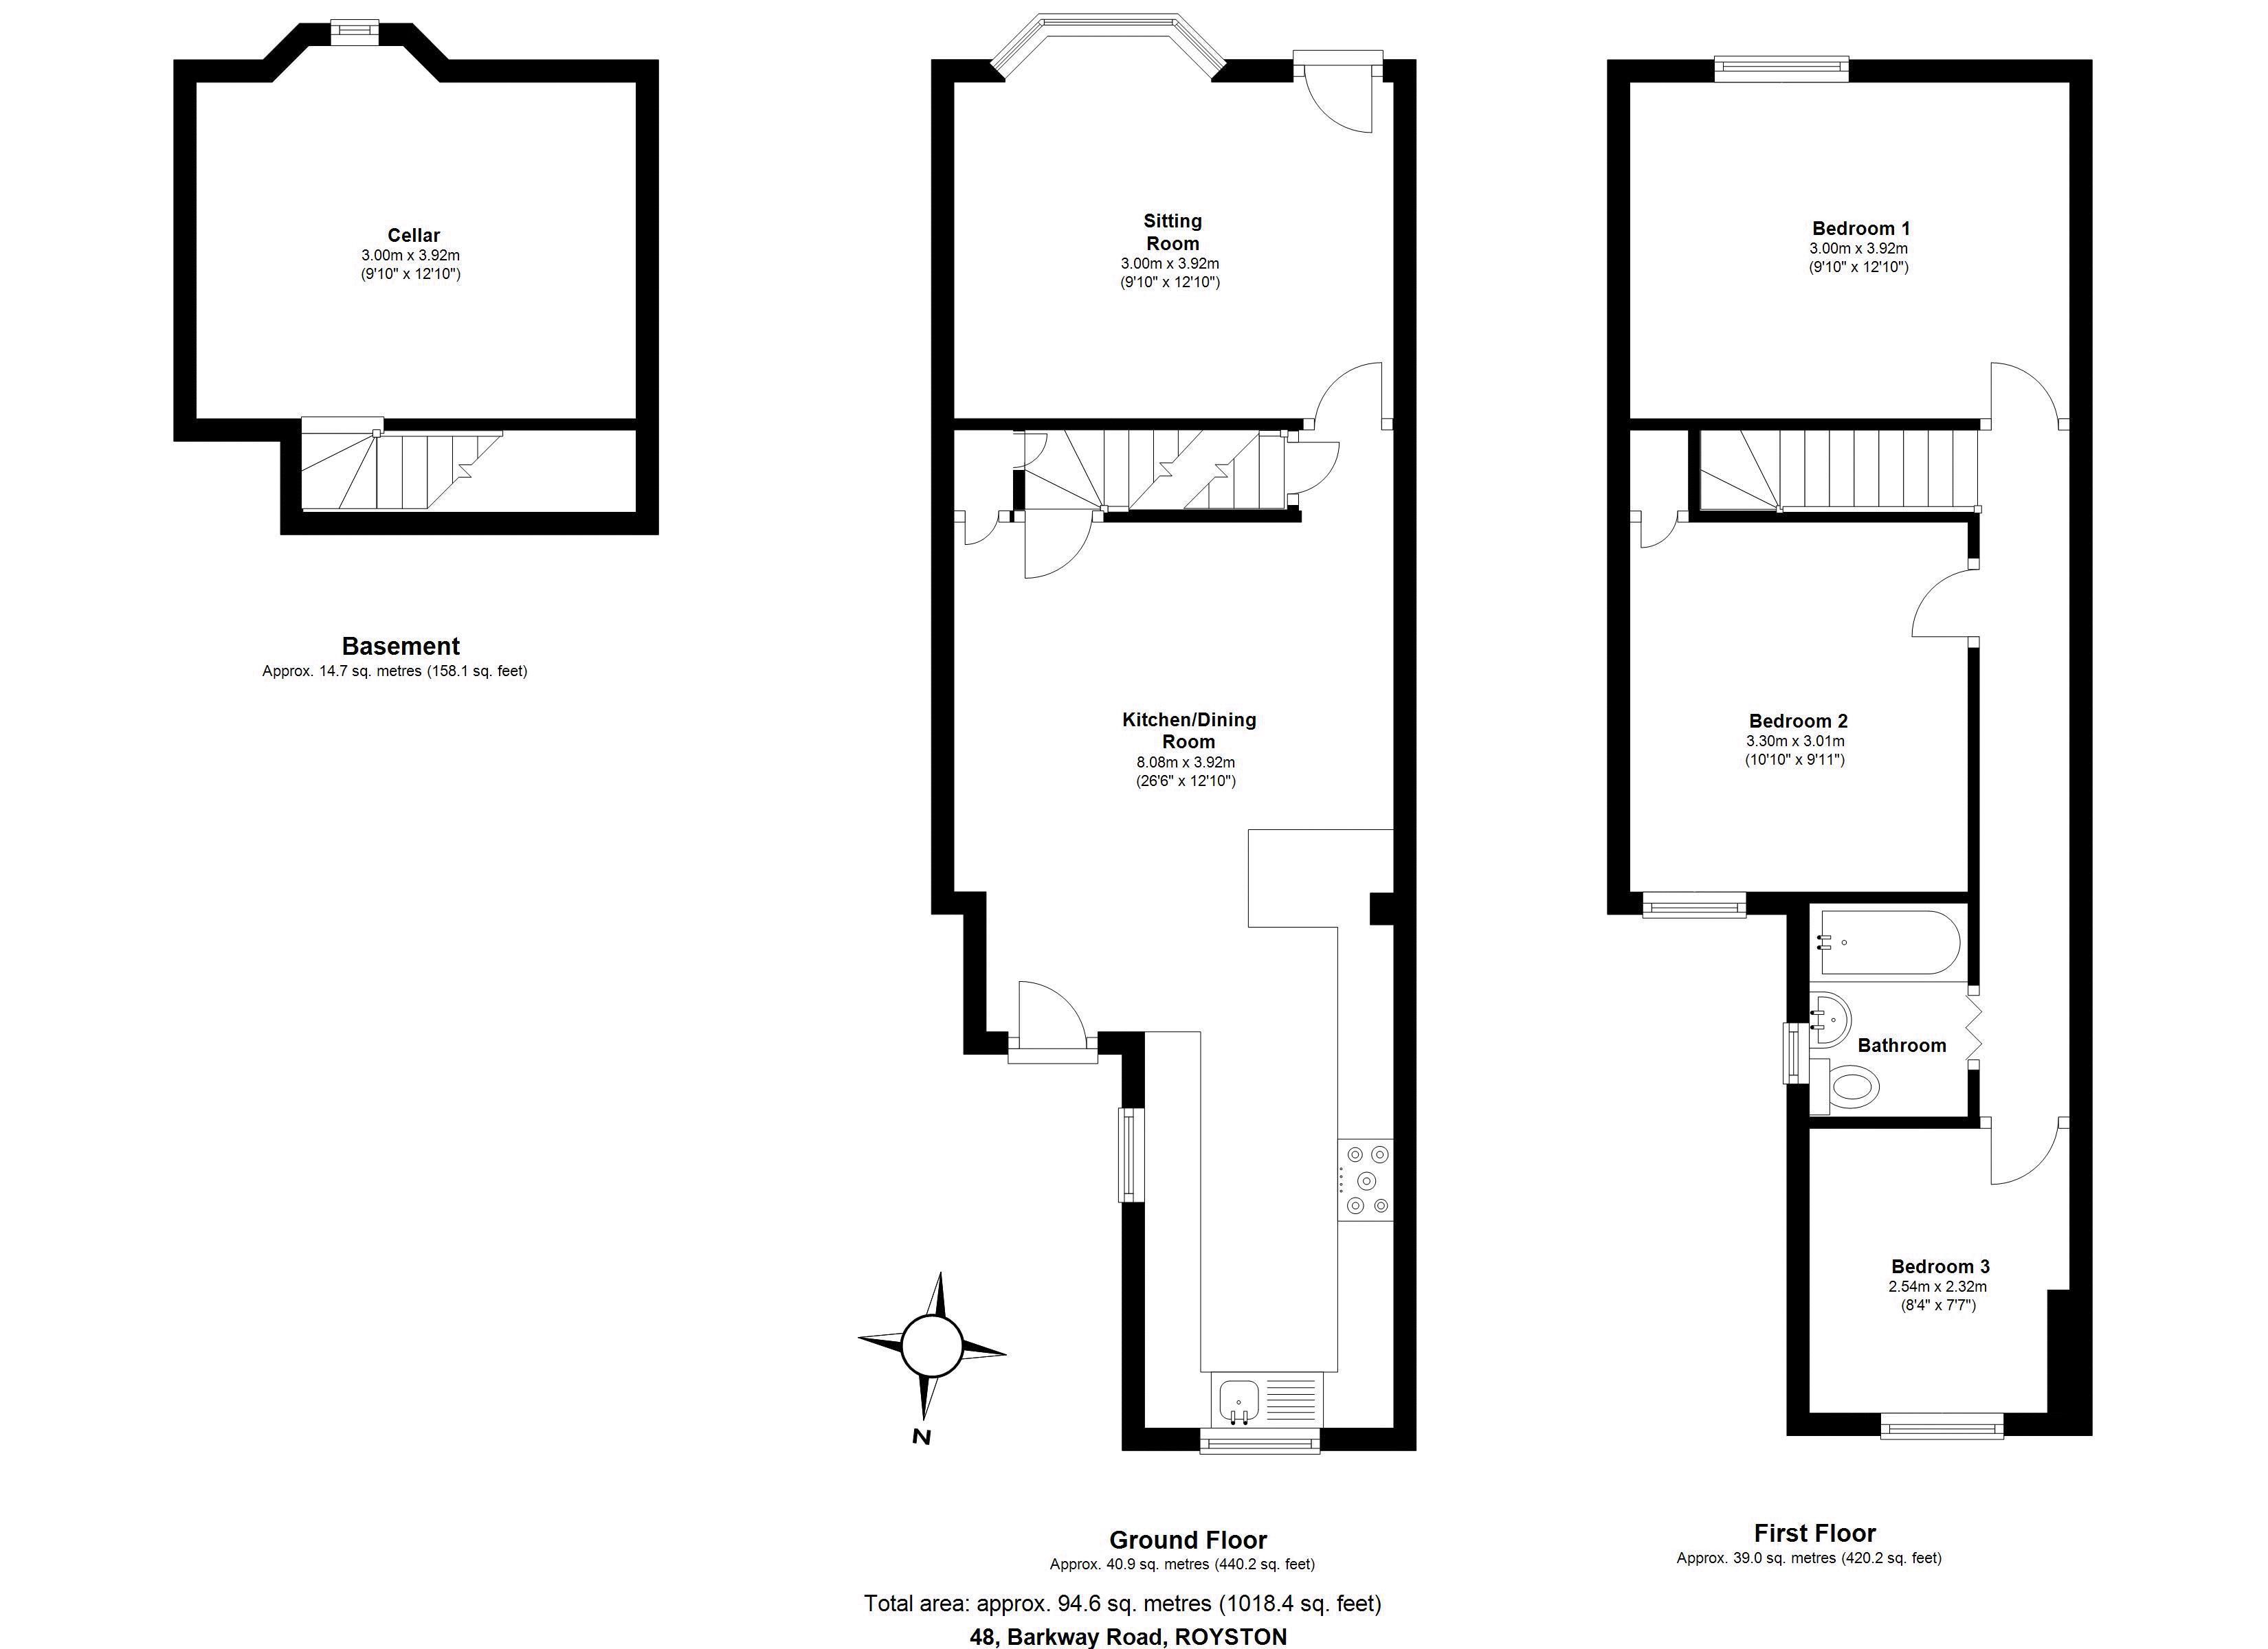 48 Barkway Road Floorplan